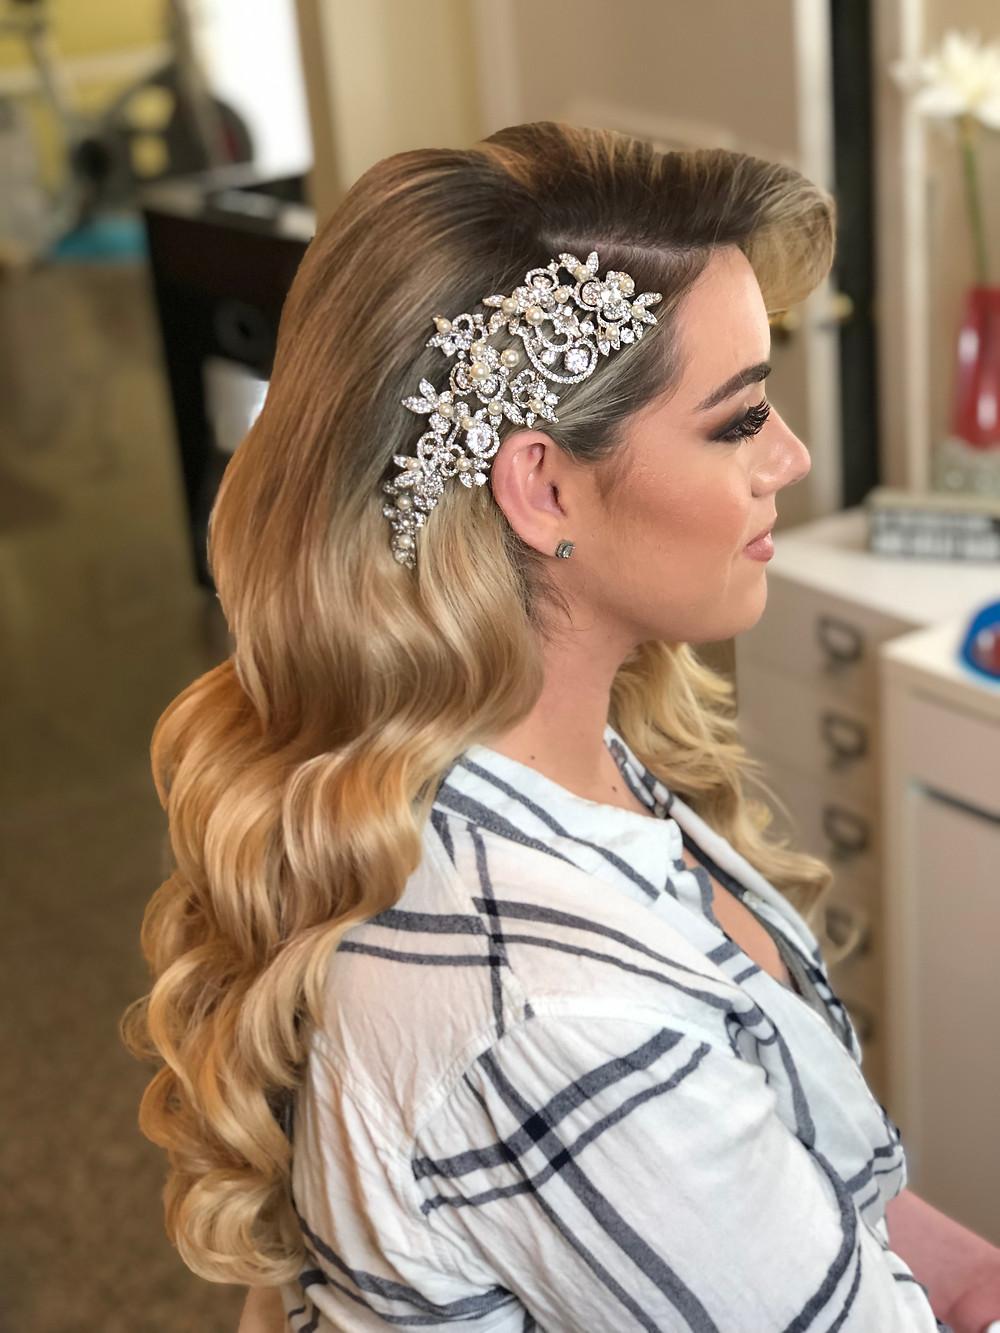 Hollywood Waves, Retro Waves, 1950's Waves, Hair Extensions, 100% Human Hair Extensions, Clip-in Hair Extensions, Long Hair, Bridal Hair, Wedding Hairstyles